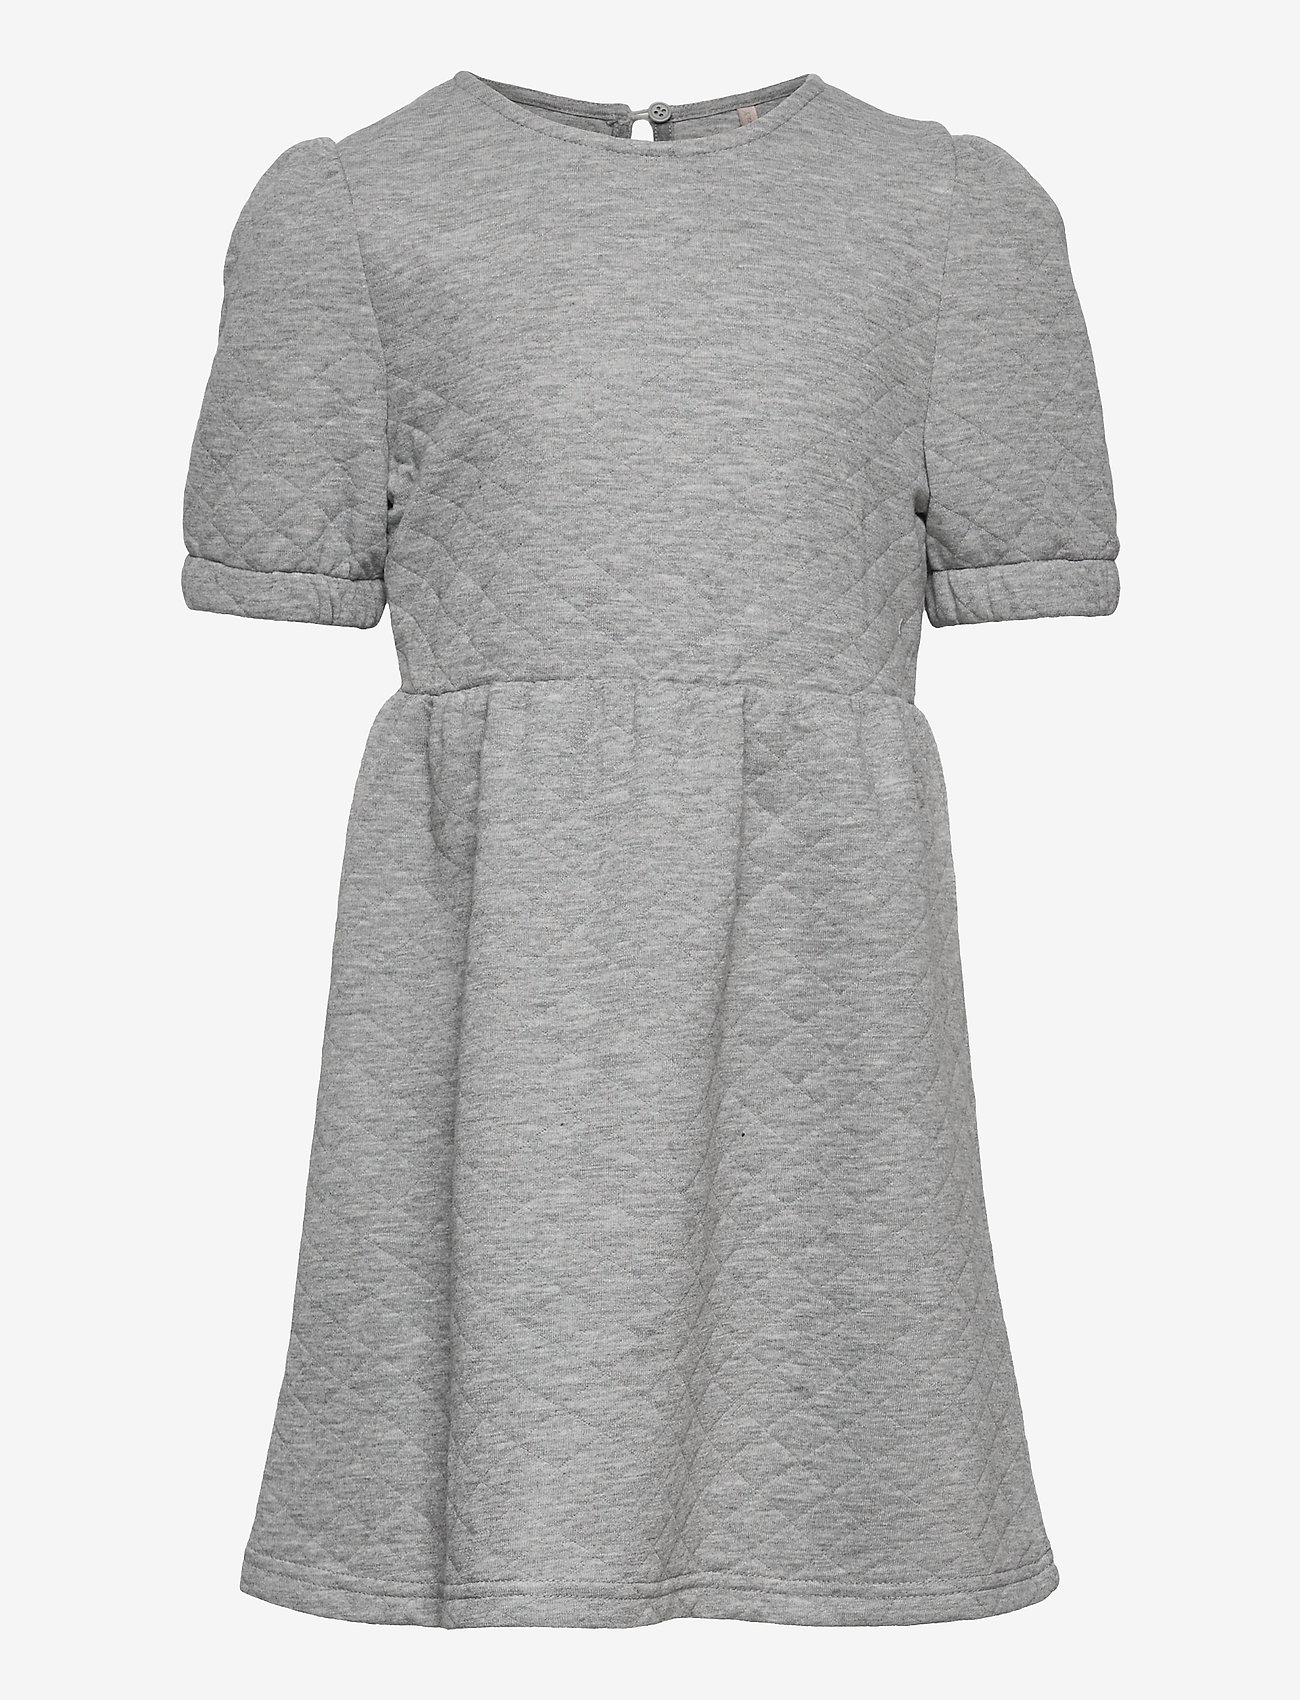 Kids Only - KONMEDINA S/S PUFF DRESS SWT - kleider - light grey melange - 0